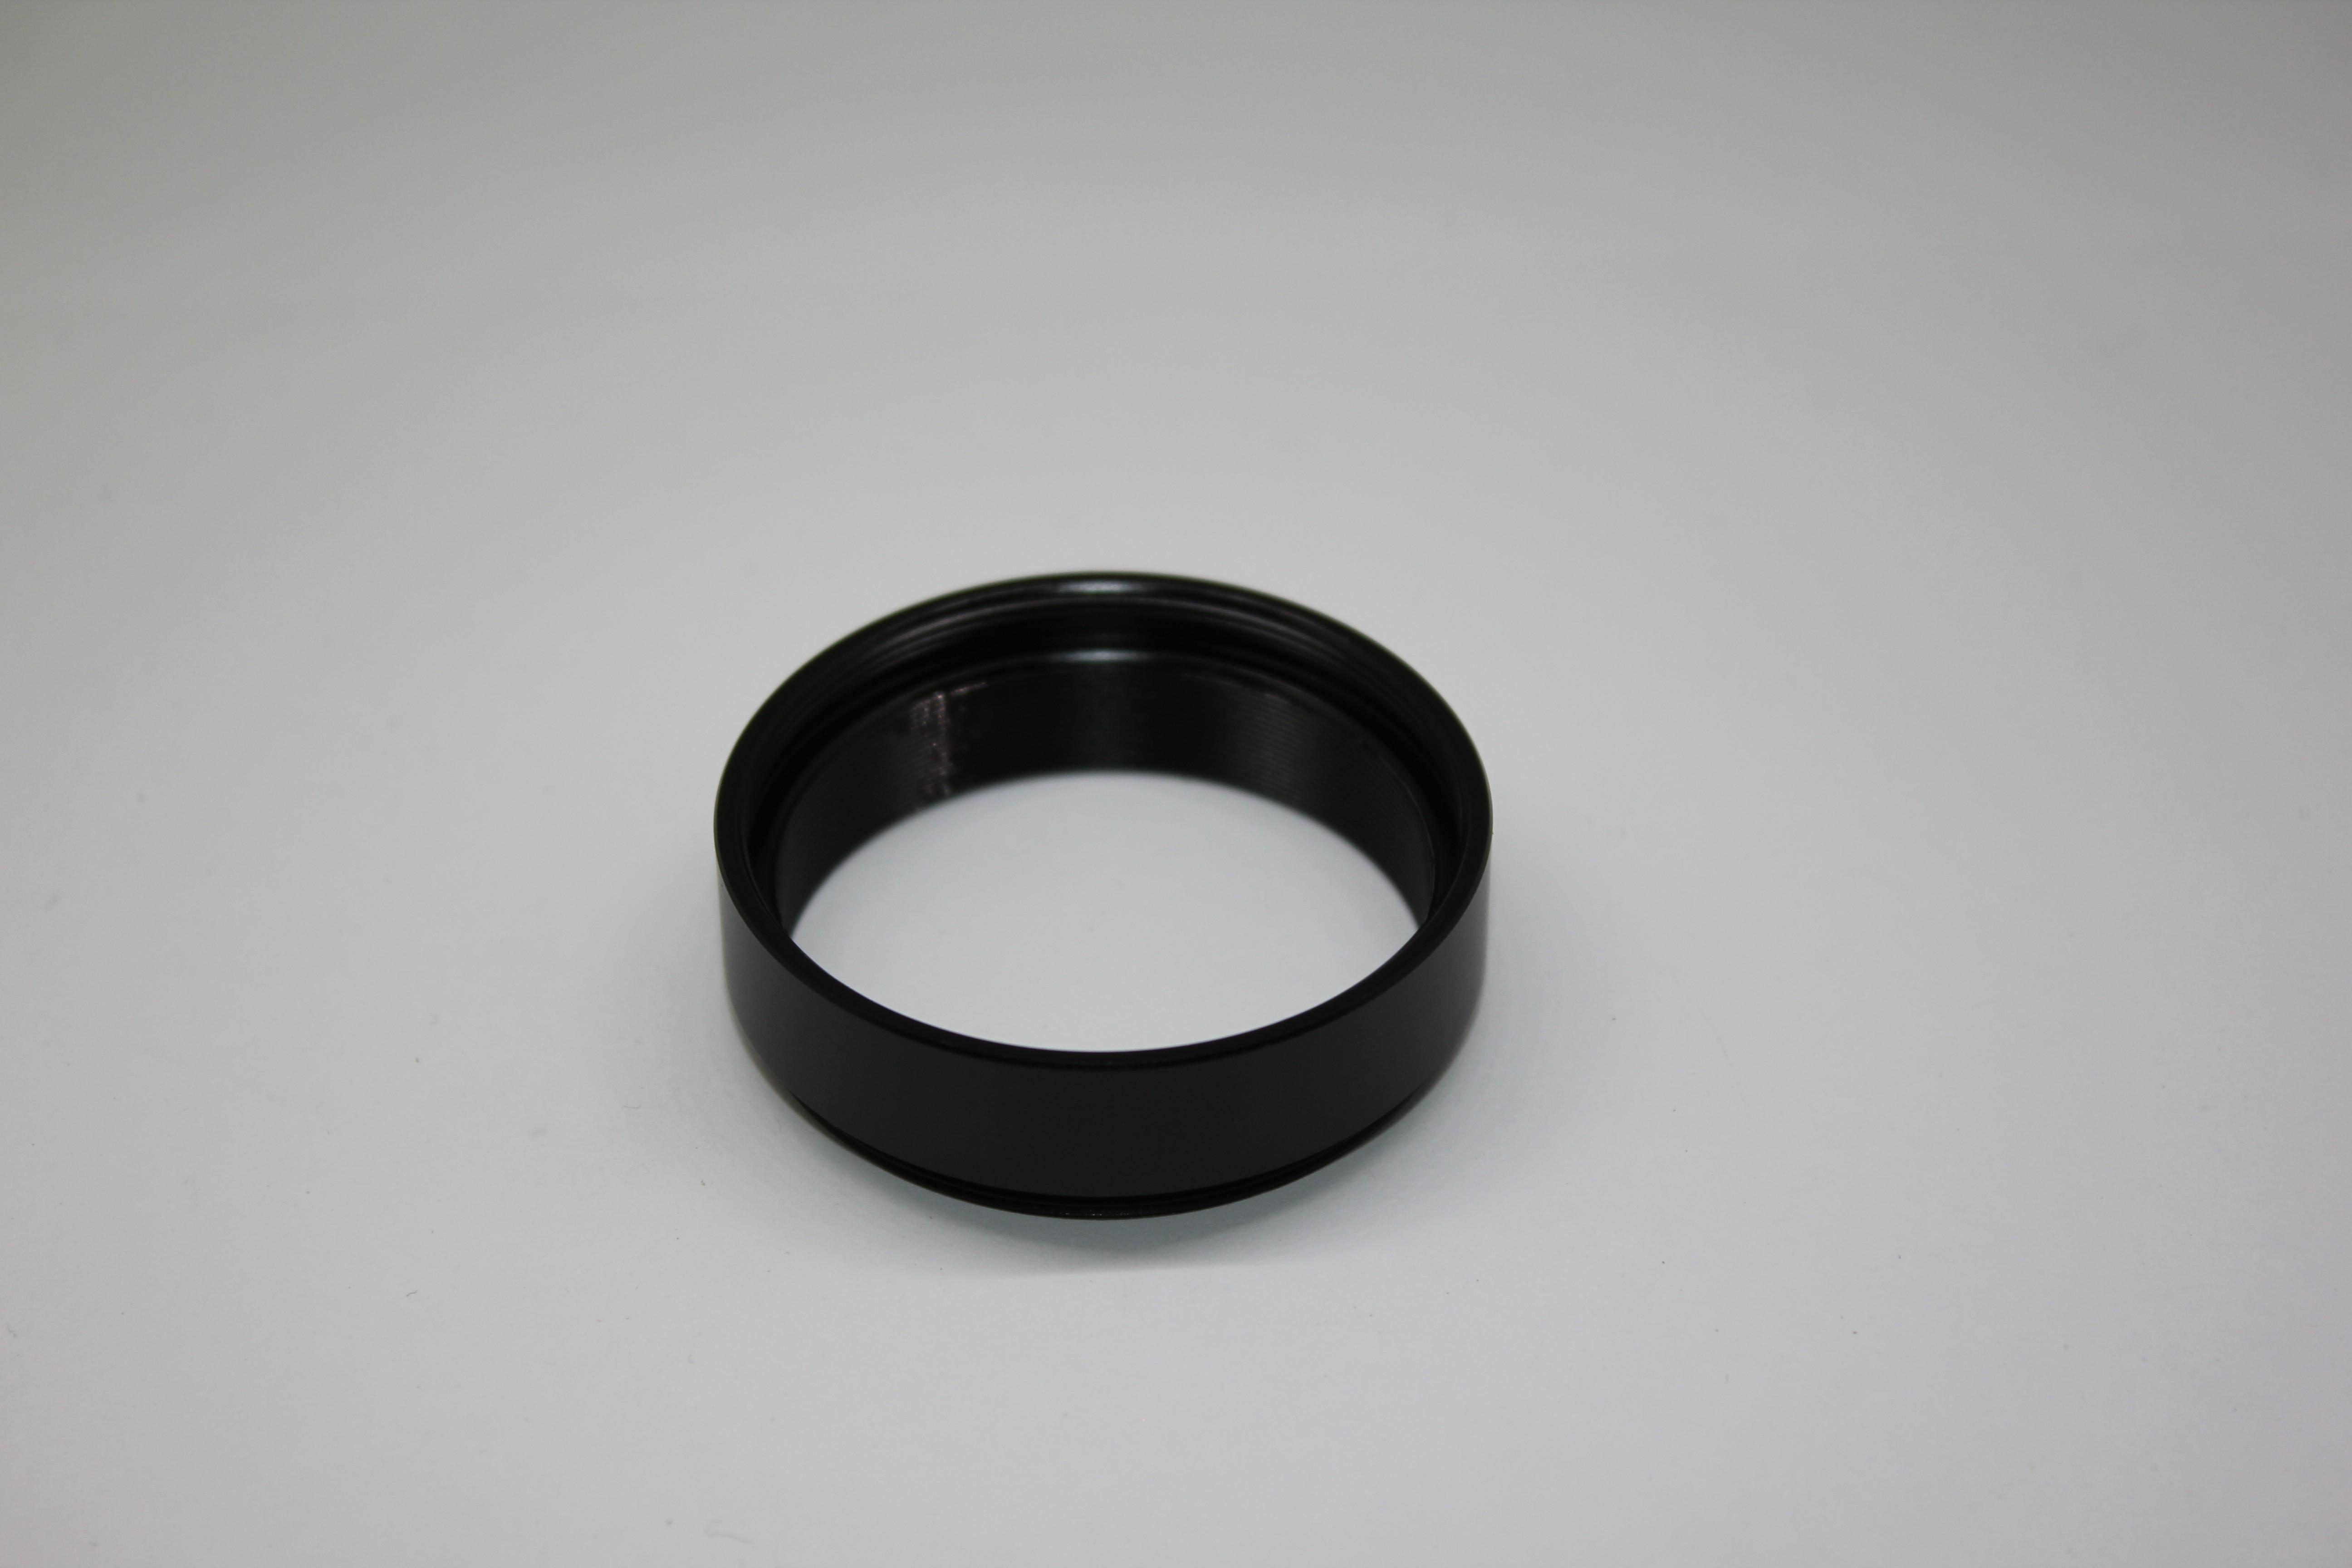 Sirius 10mm M42 Spacer